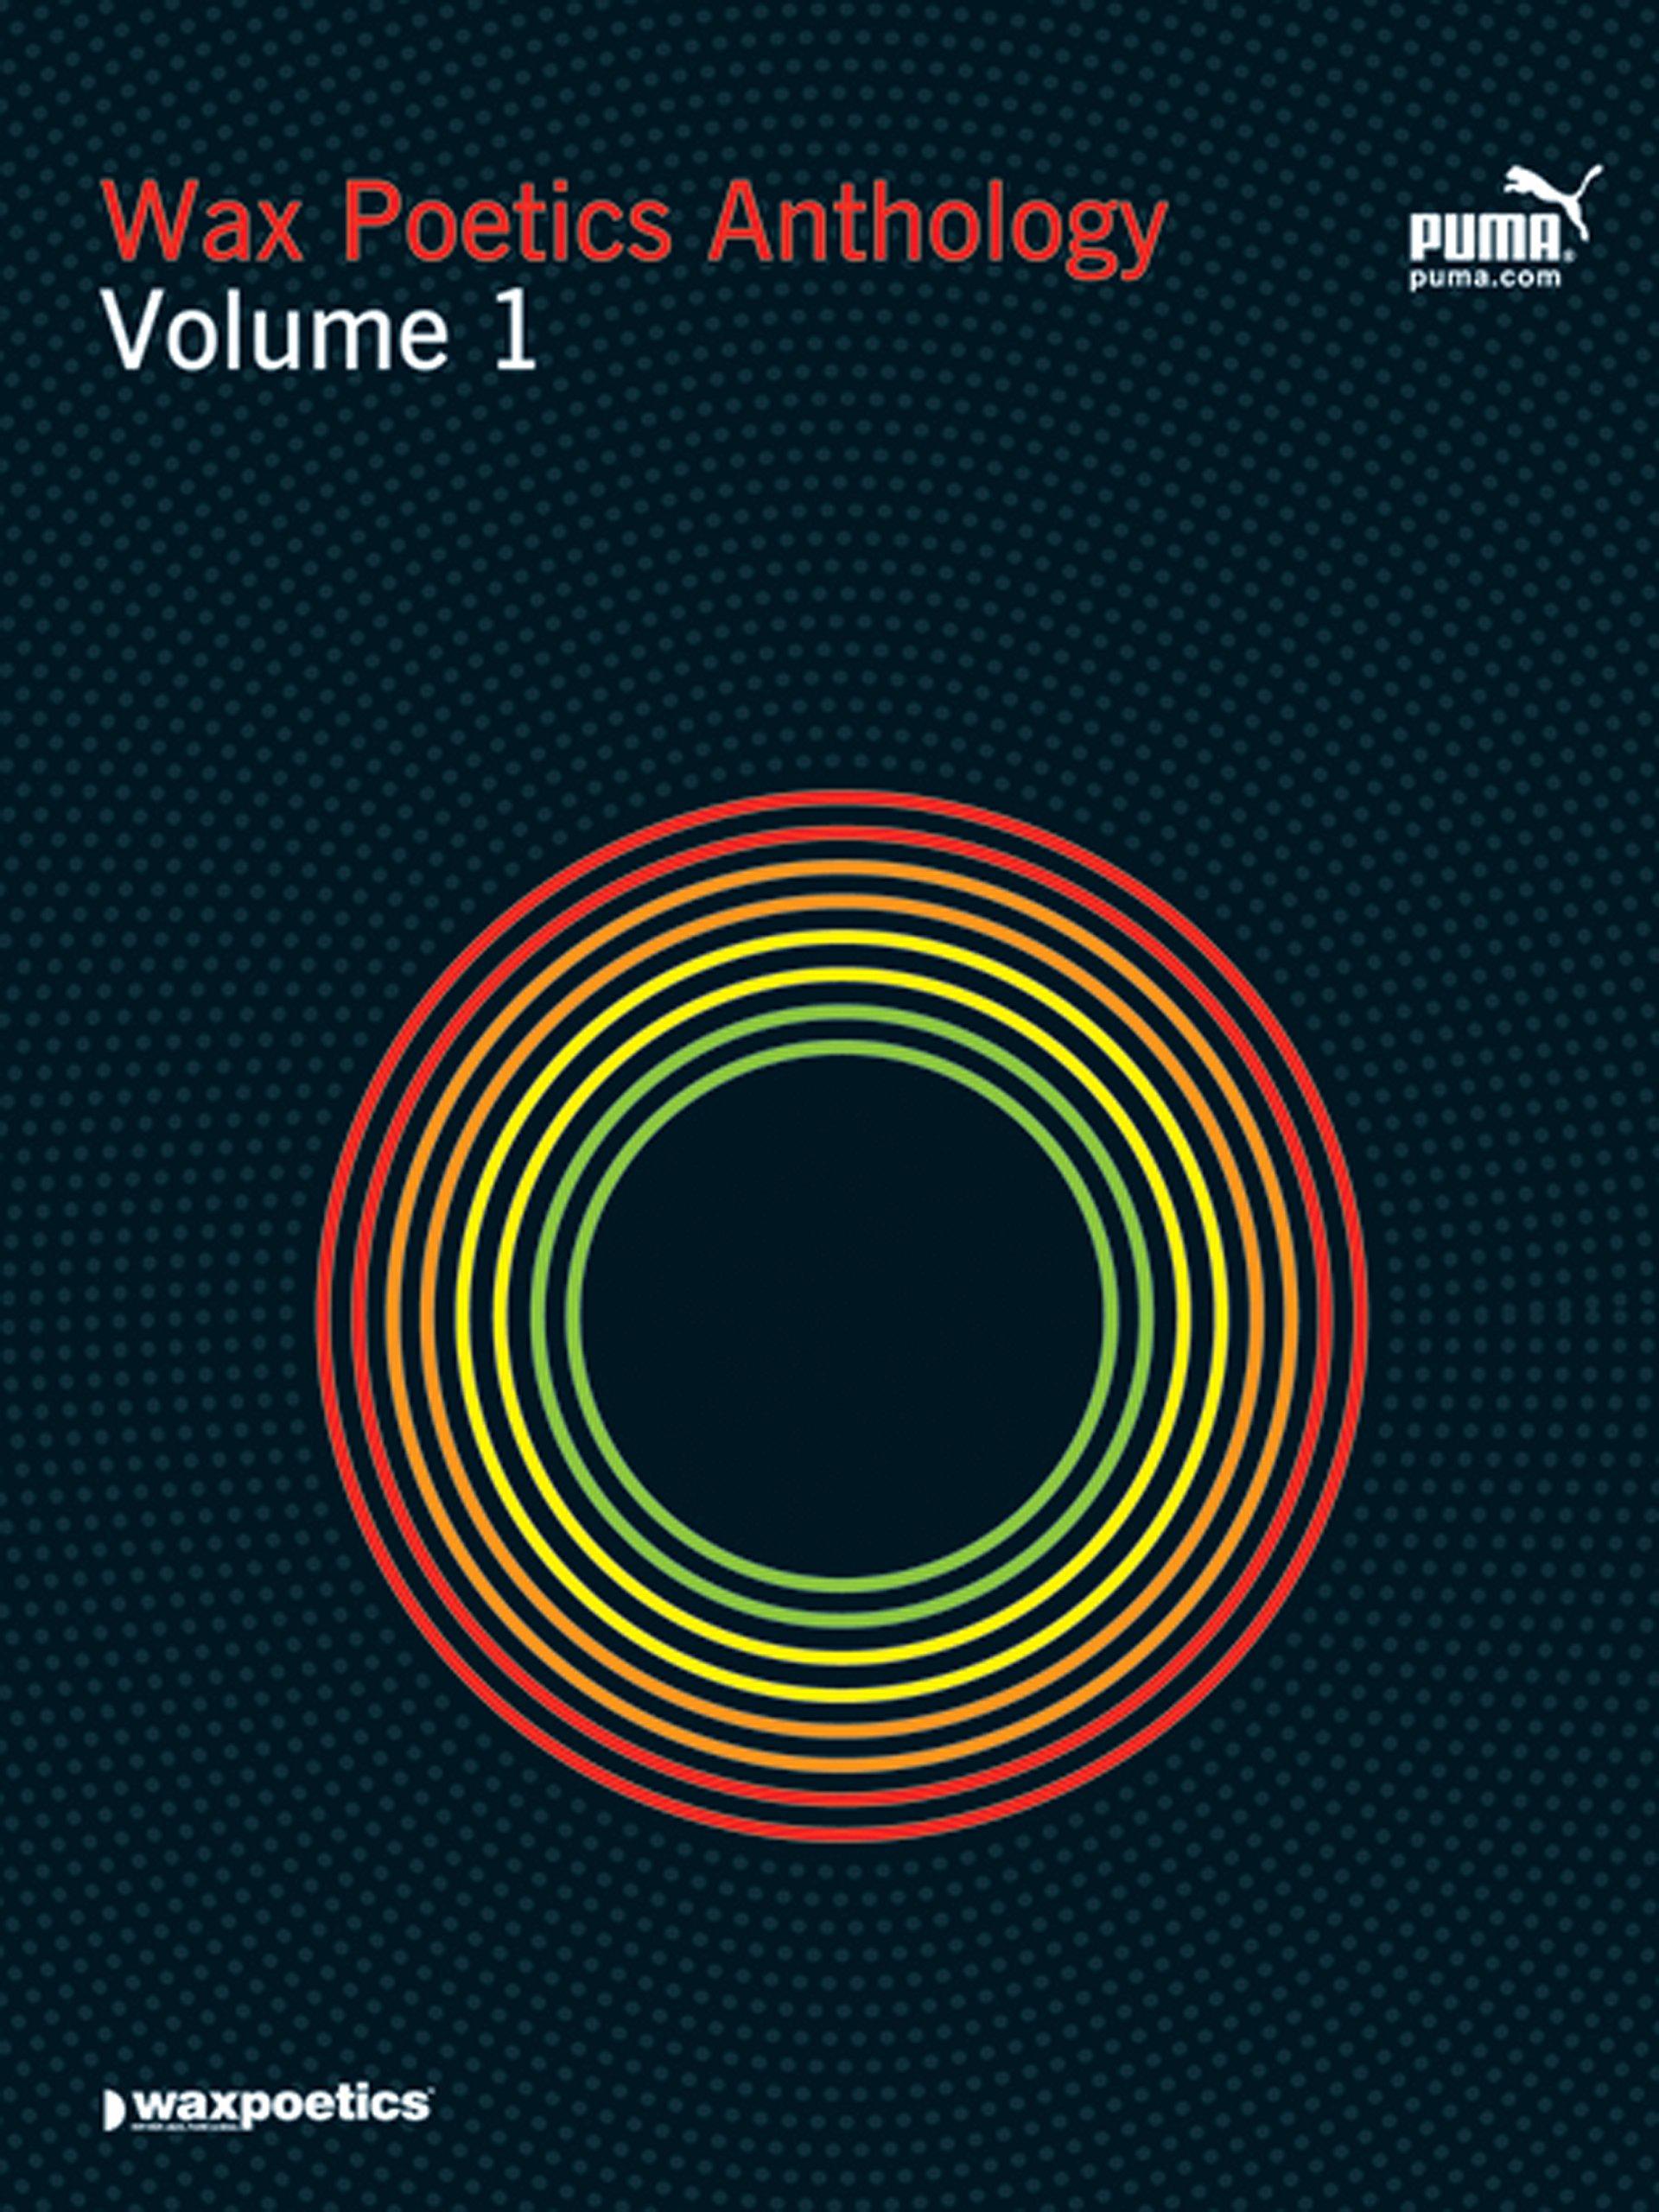 Wax Poetics Anthology Volume 1